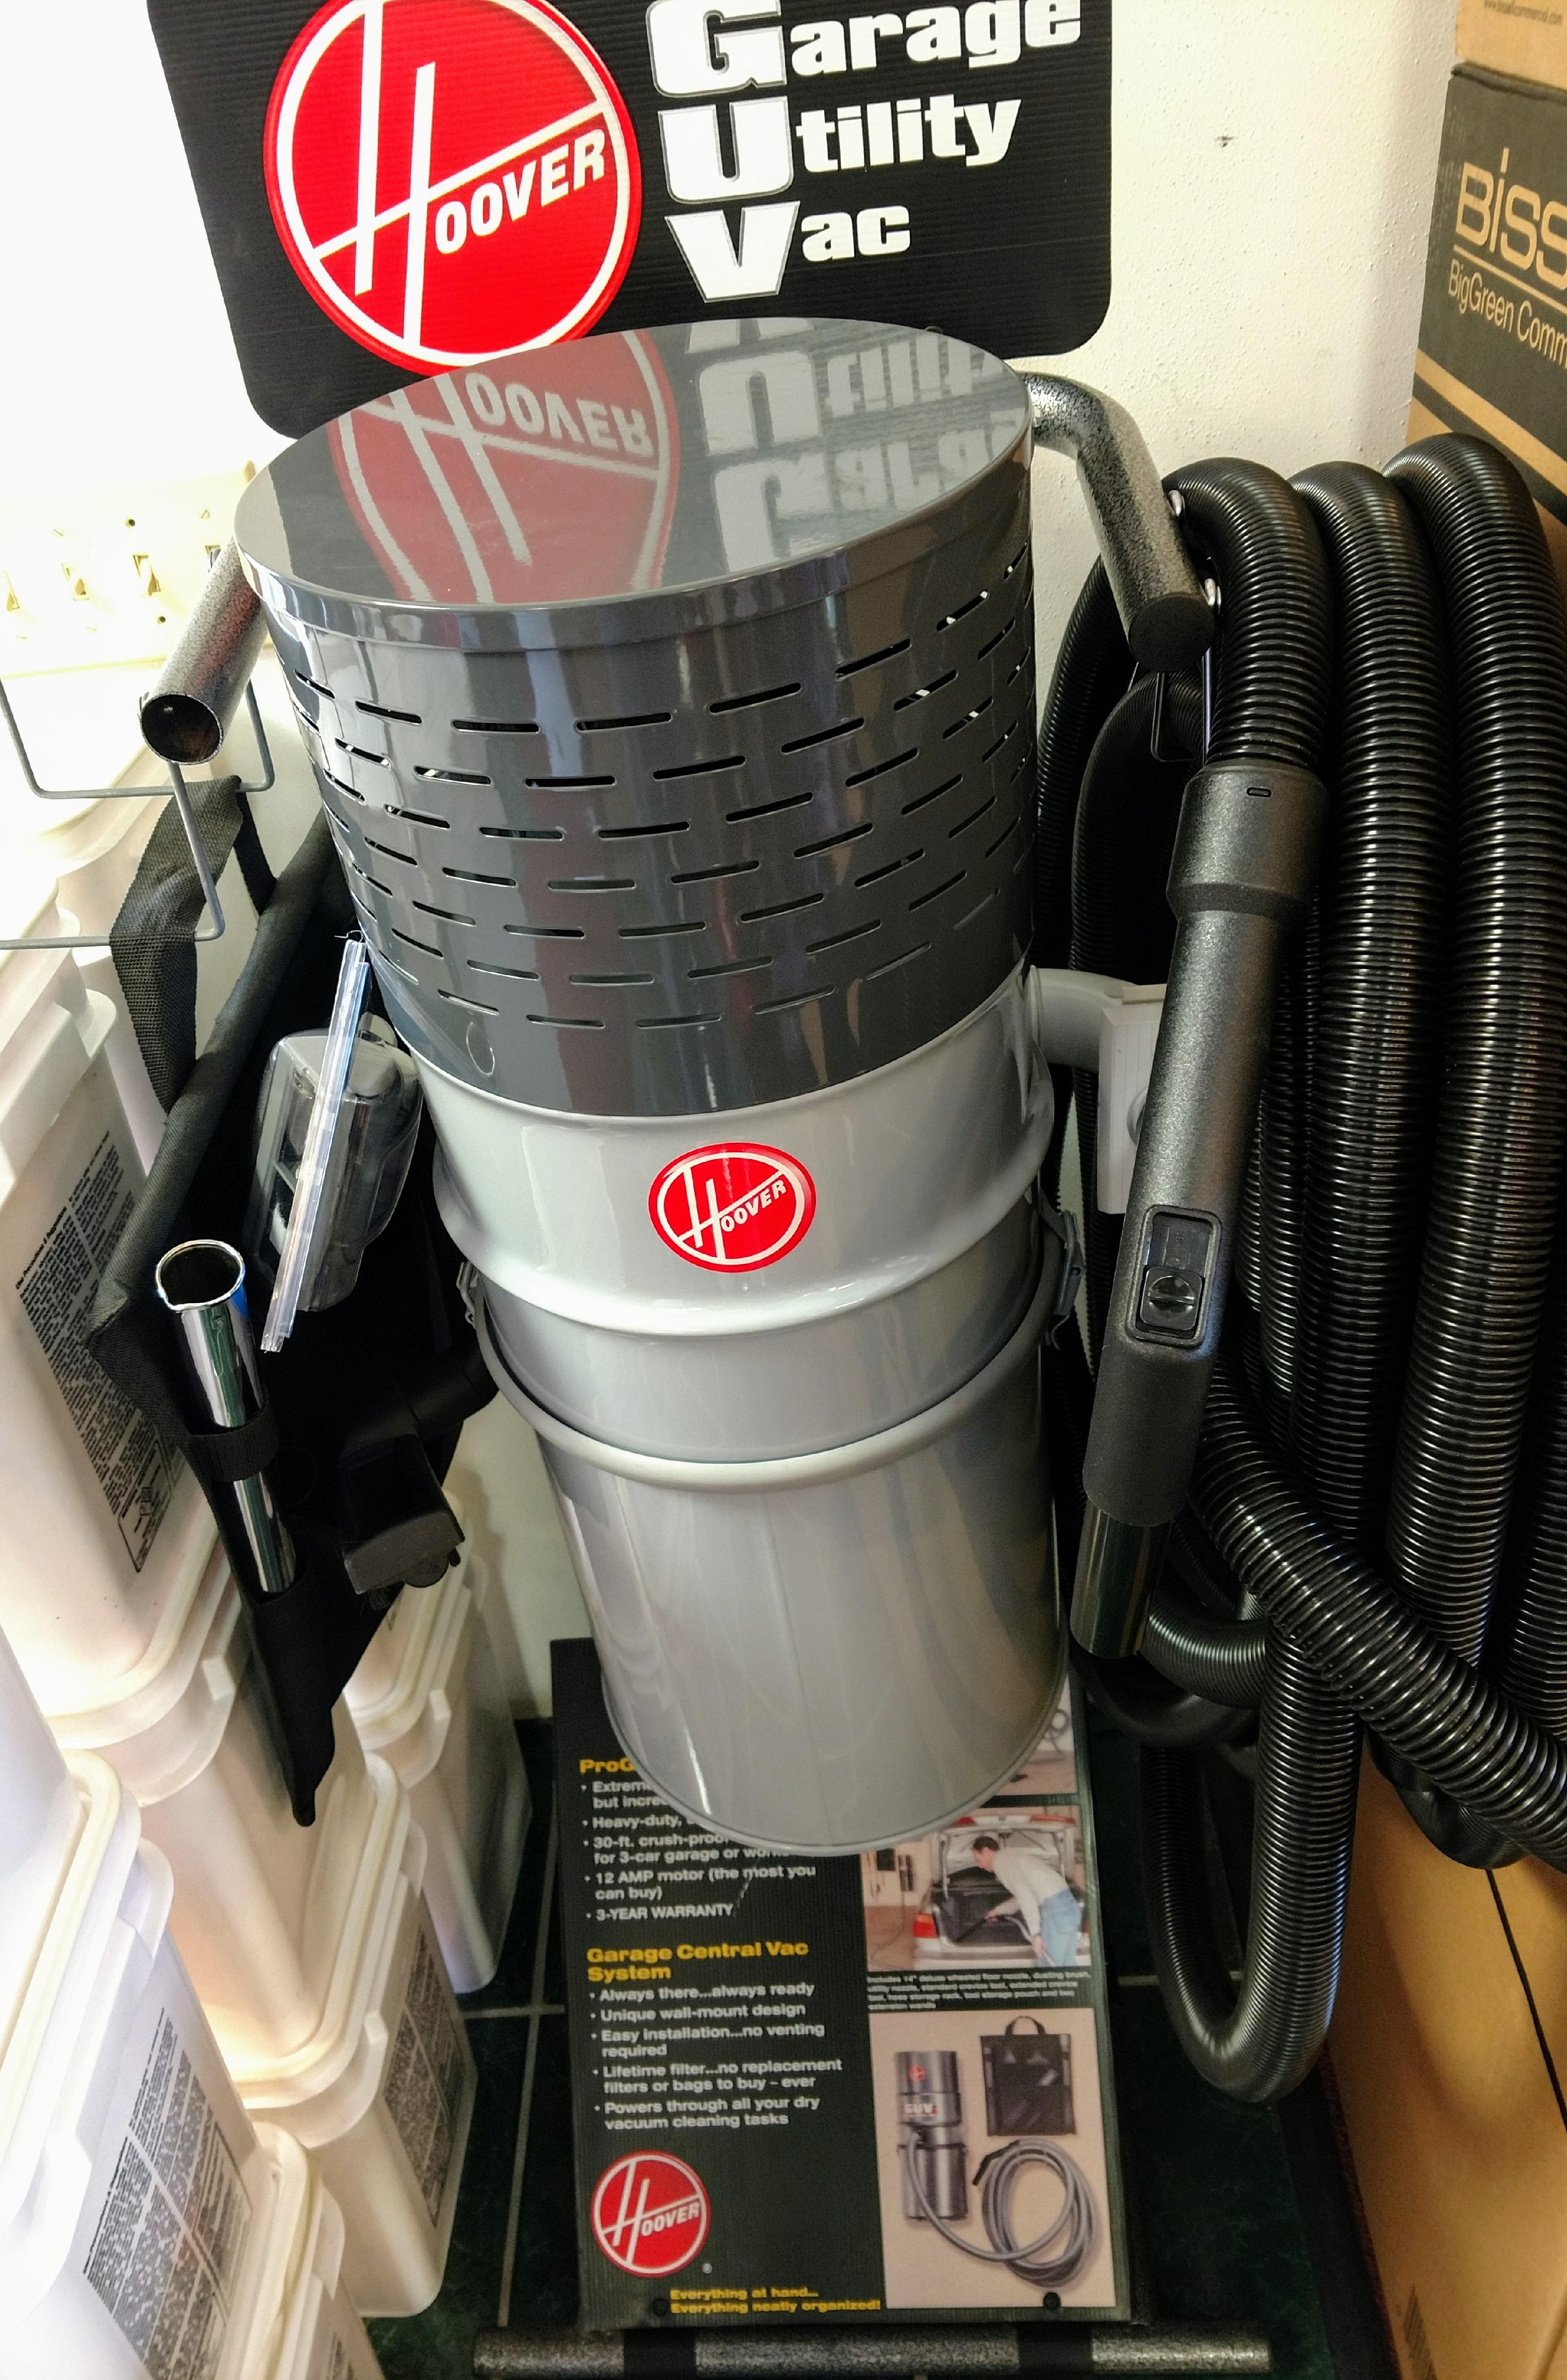 Hoover GUV Garage Utility Vacuum L2310